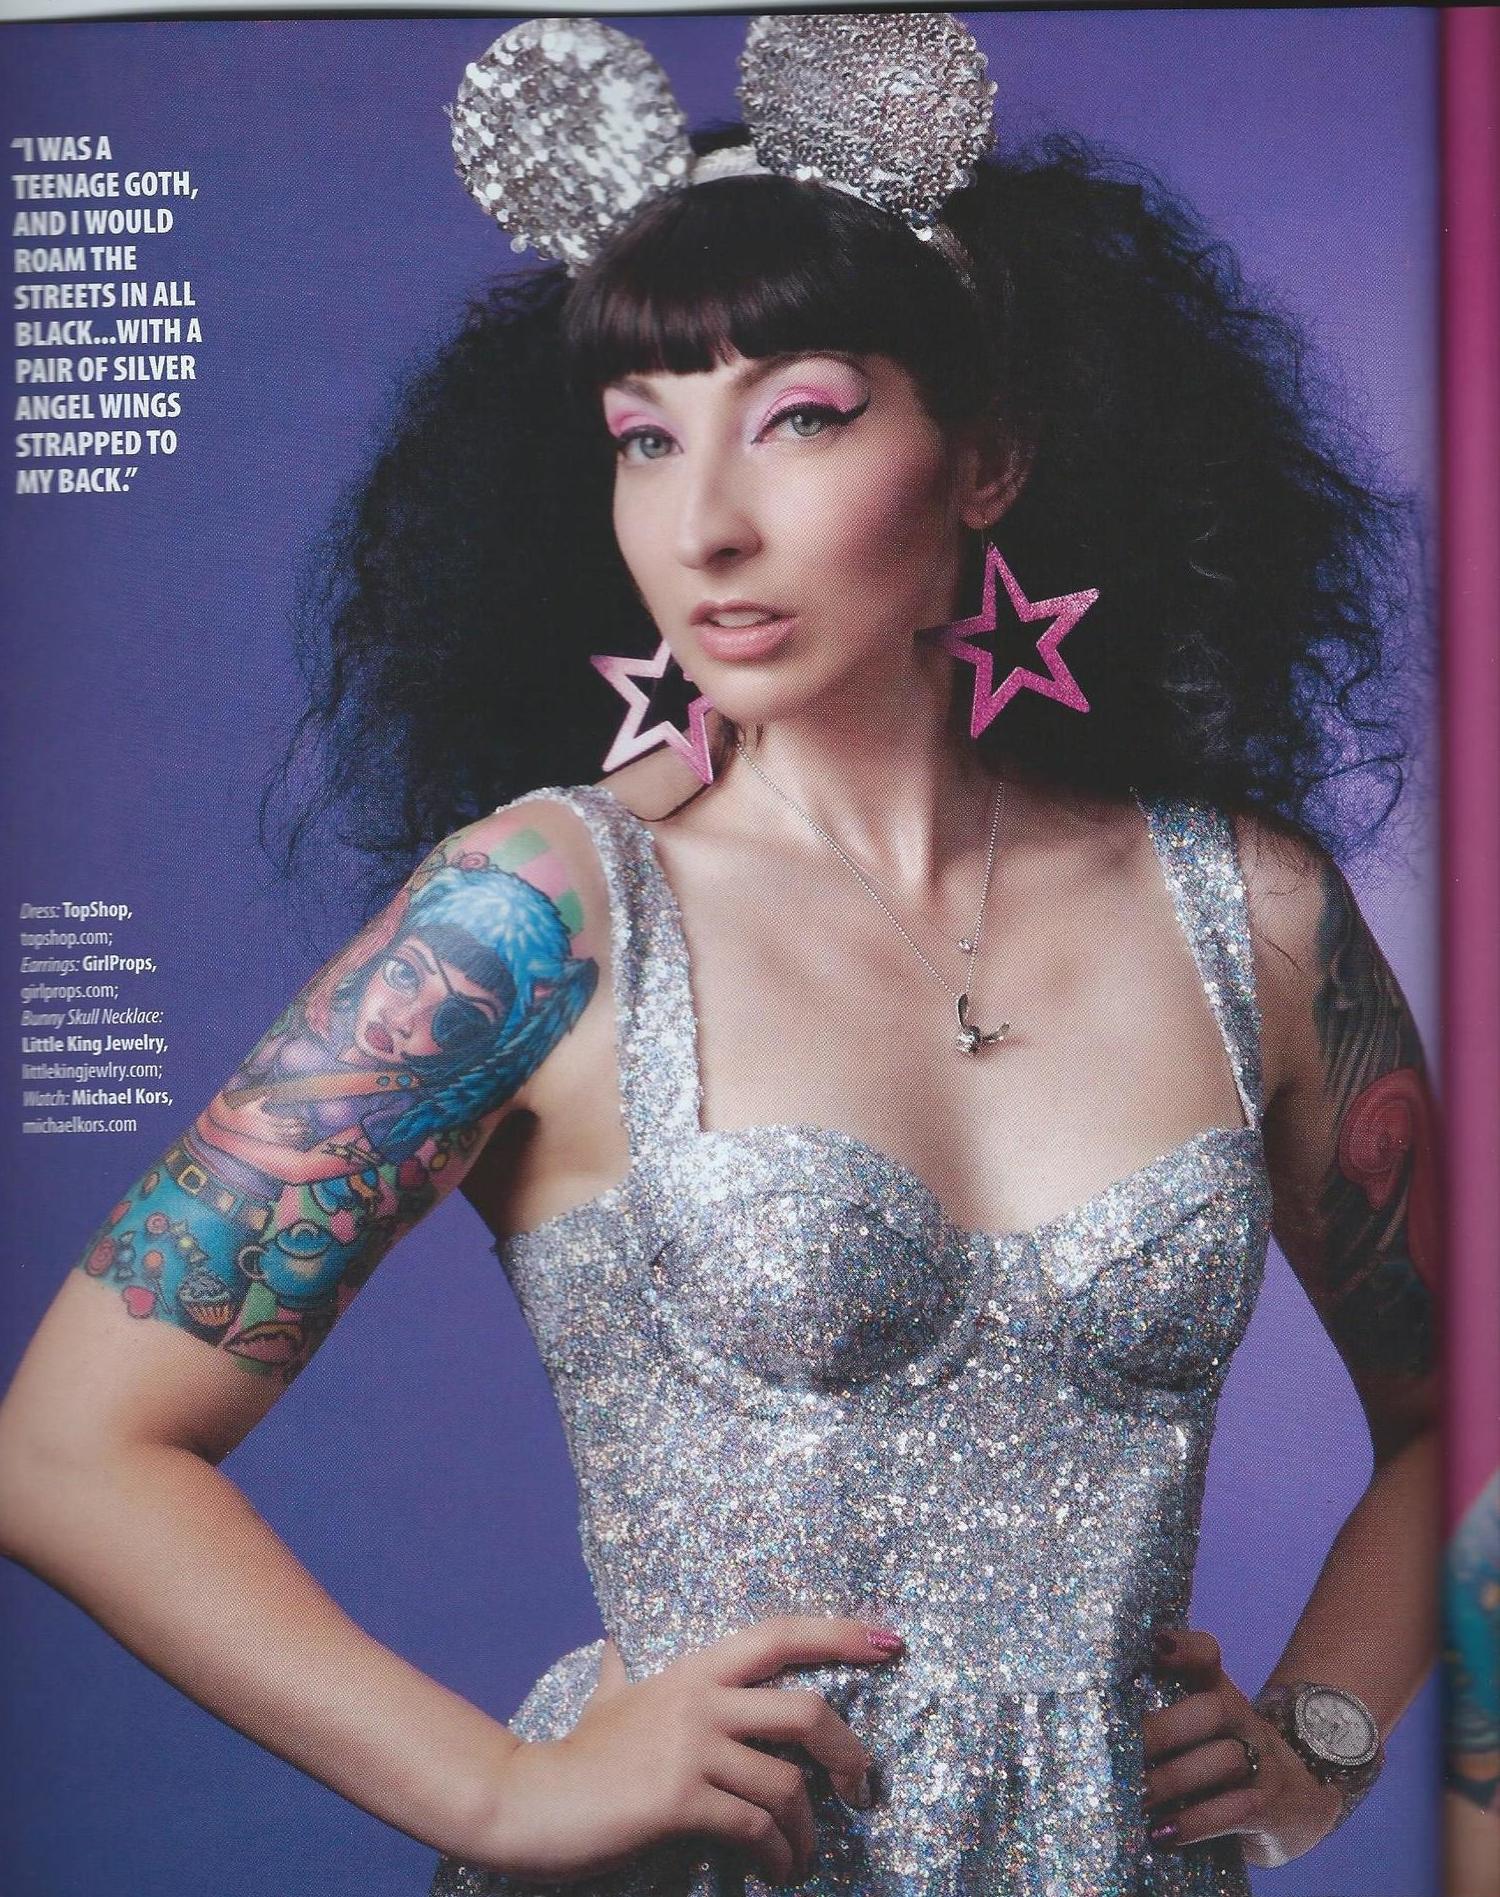 Gala Darling for Ink Fashion Magazine